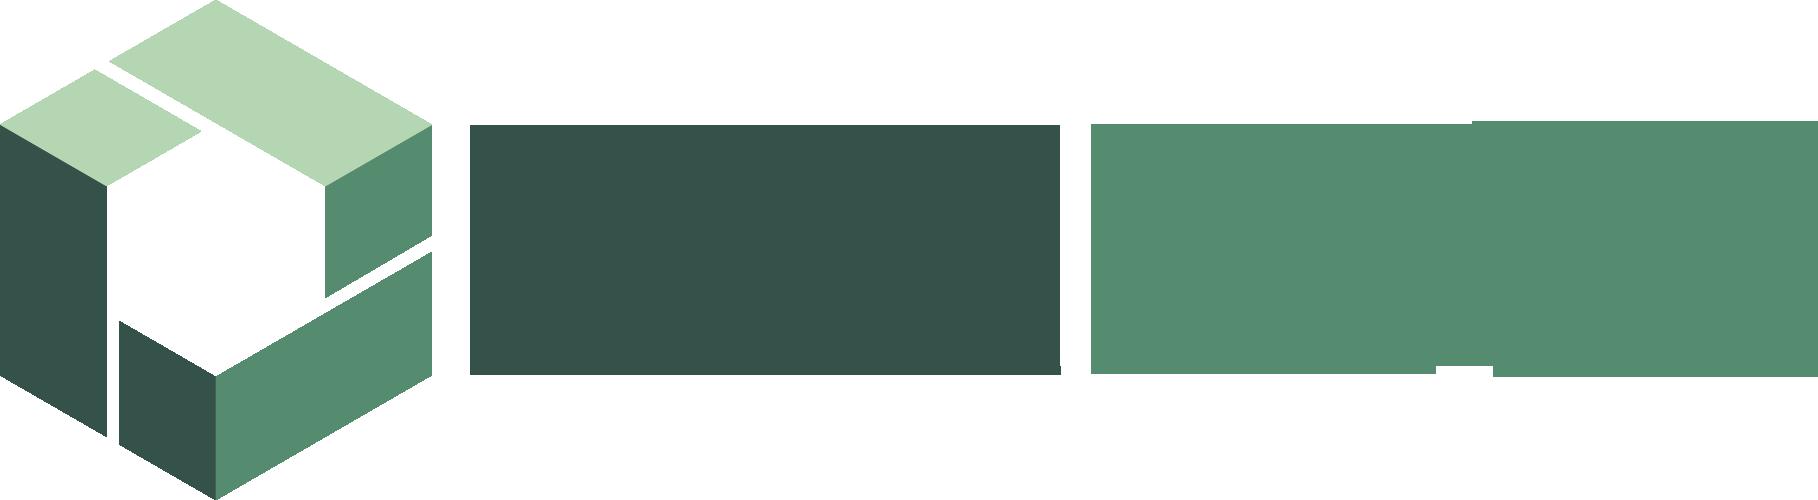 Meta Priori